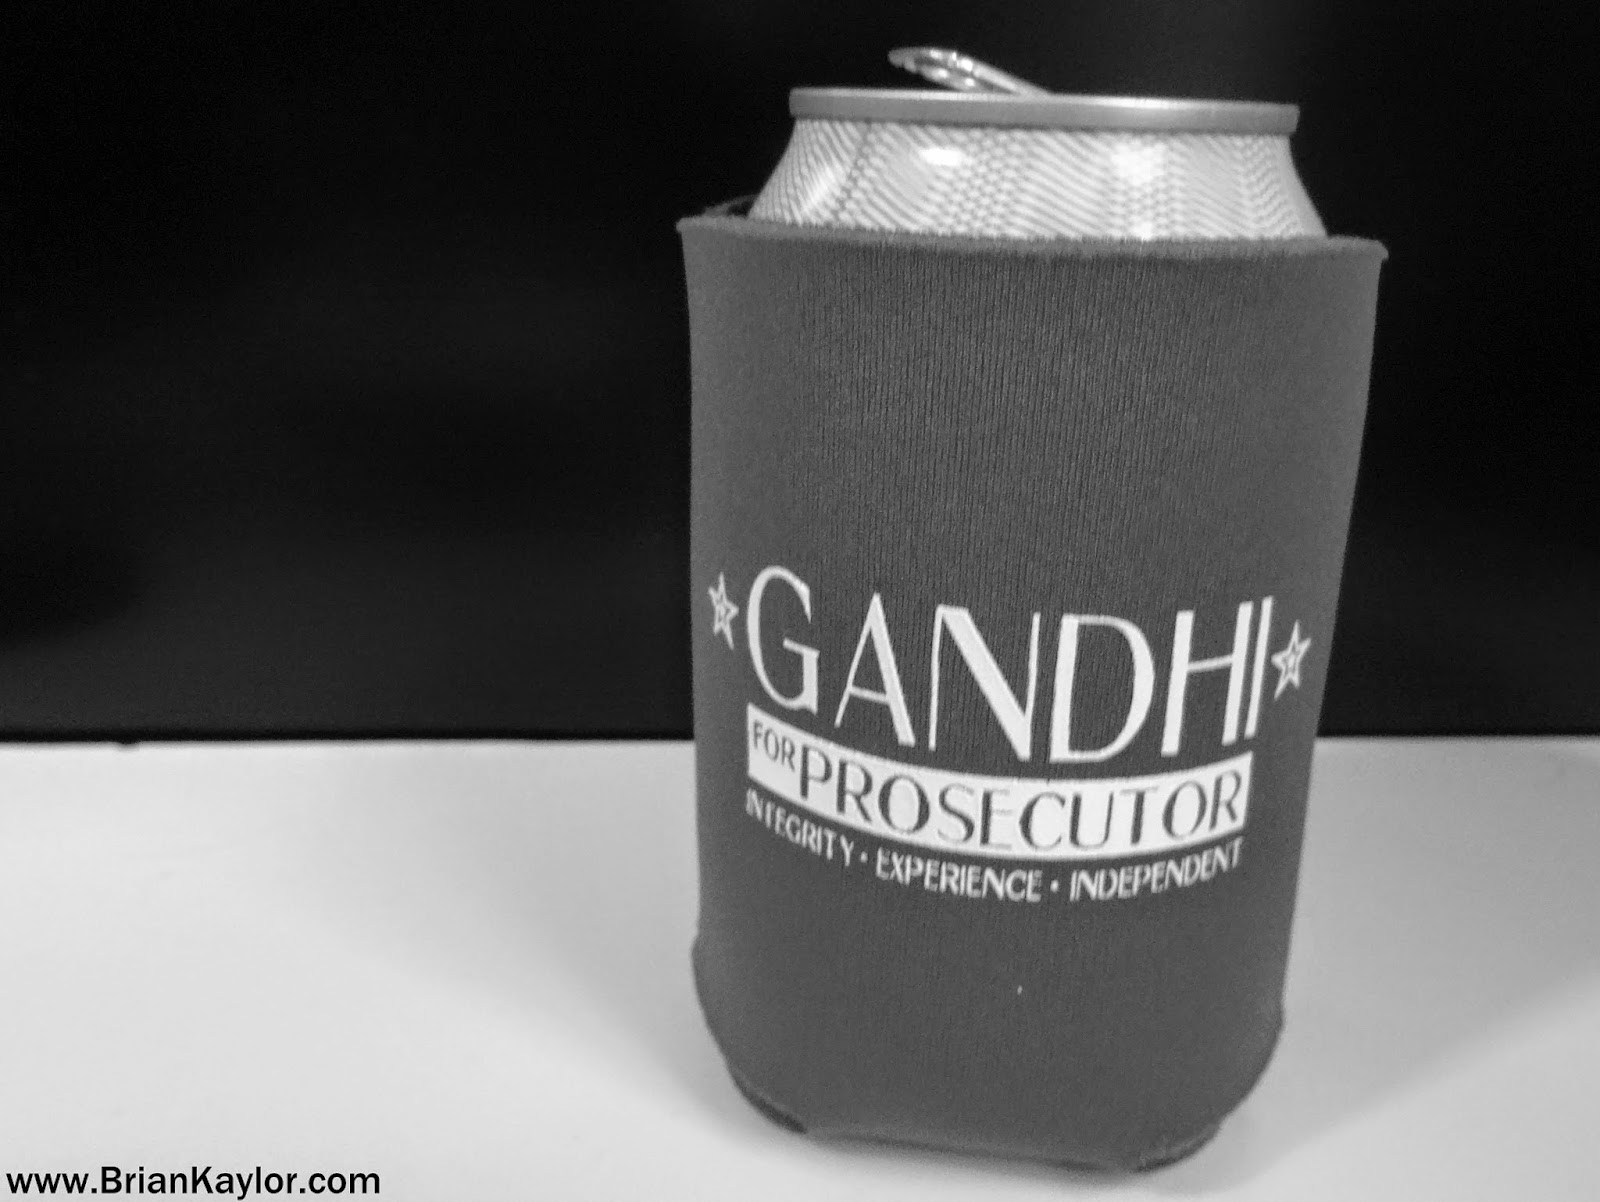 Gandhi for Prosecutor?